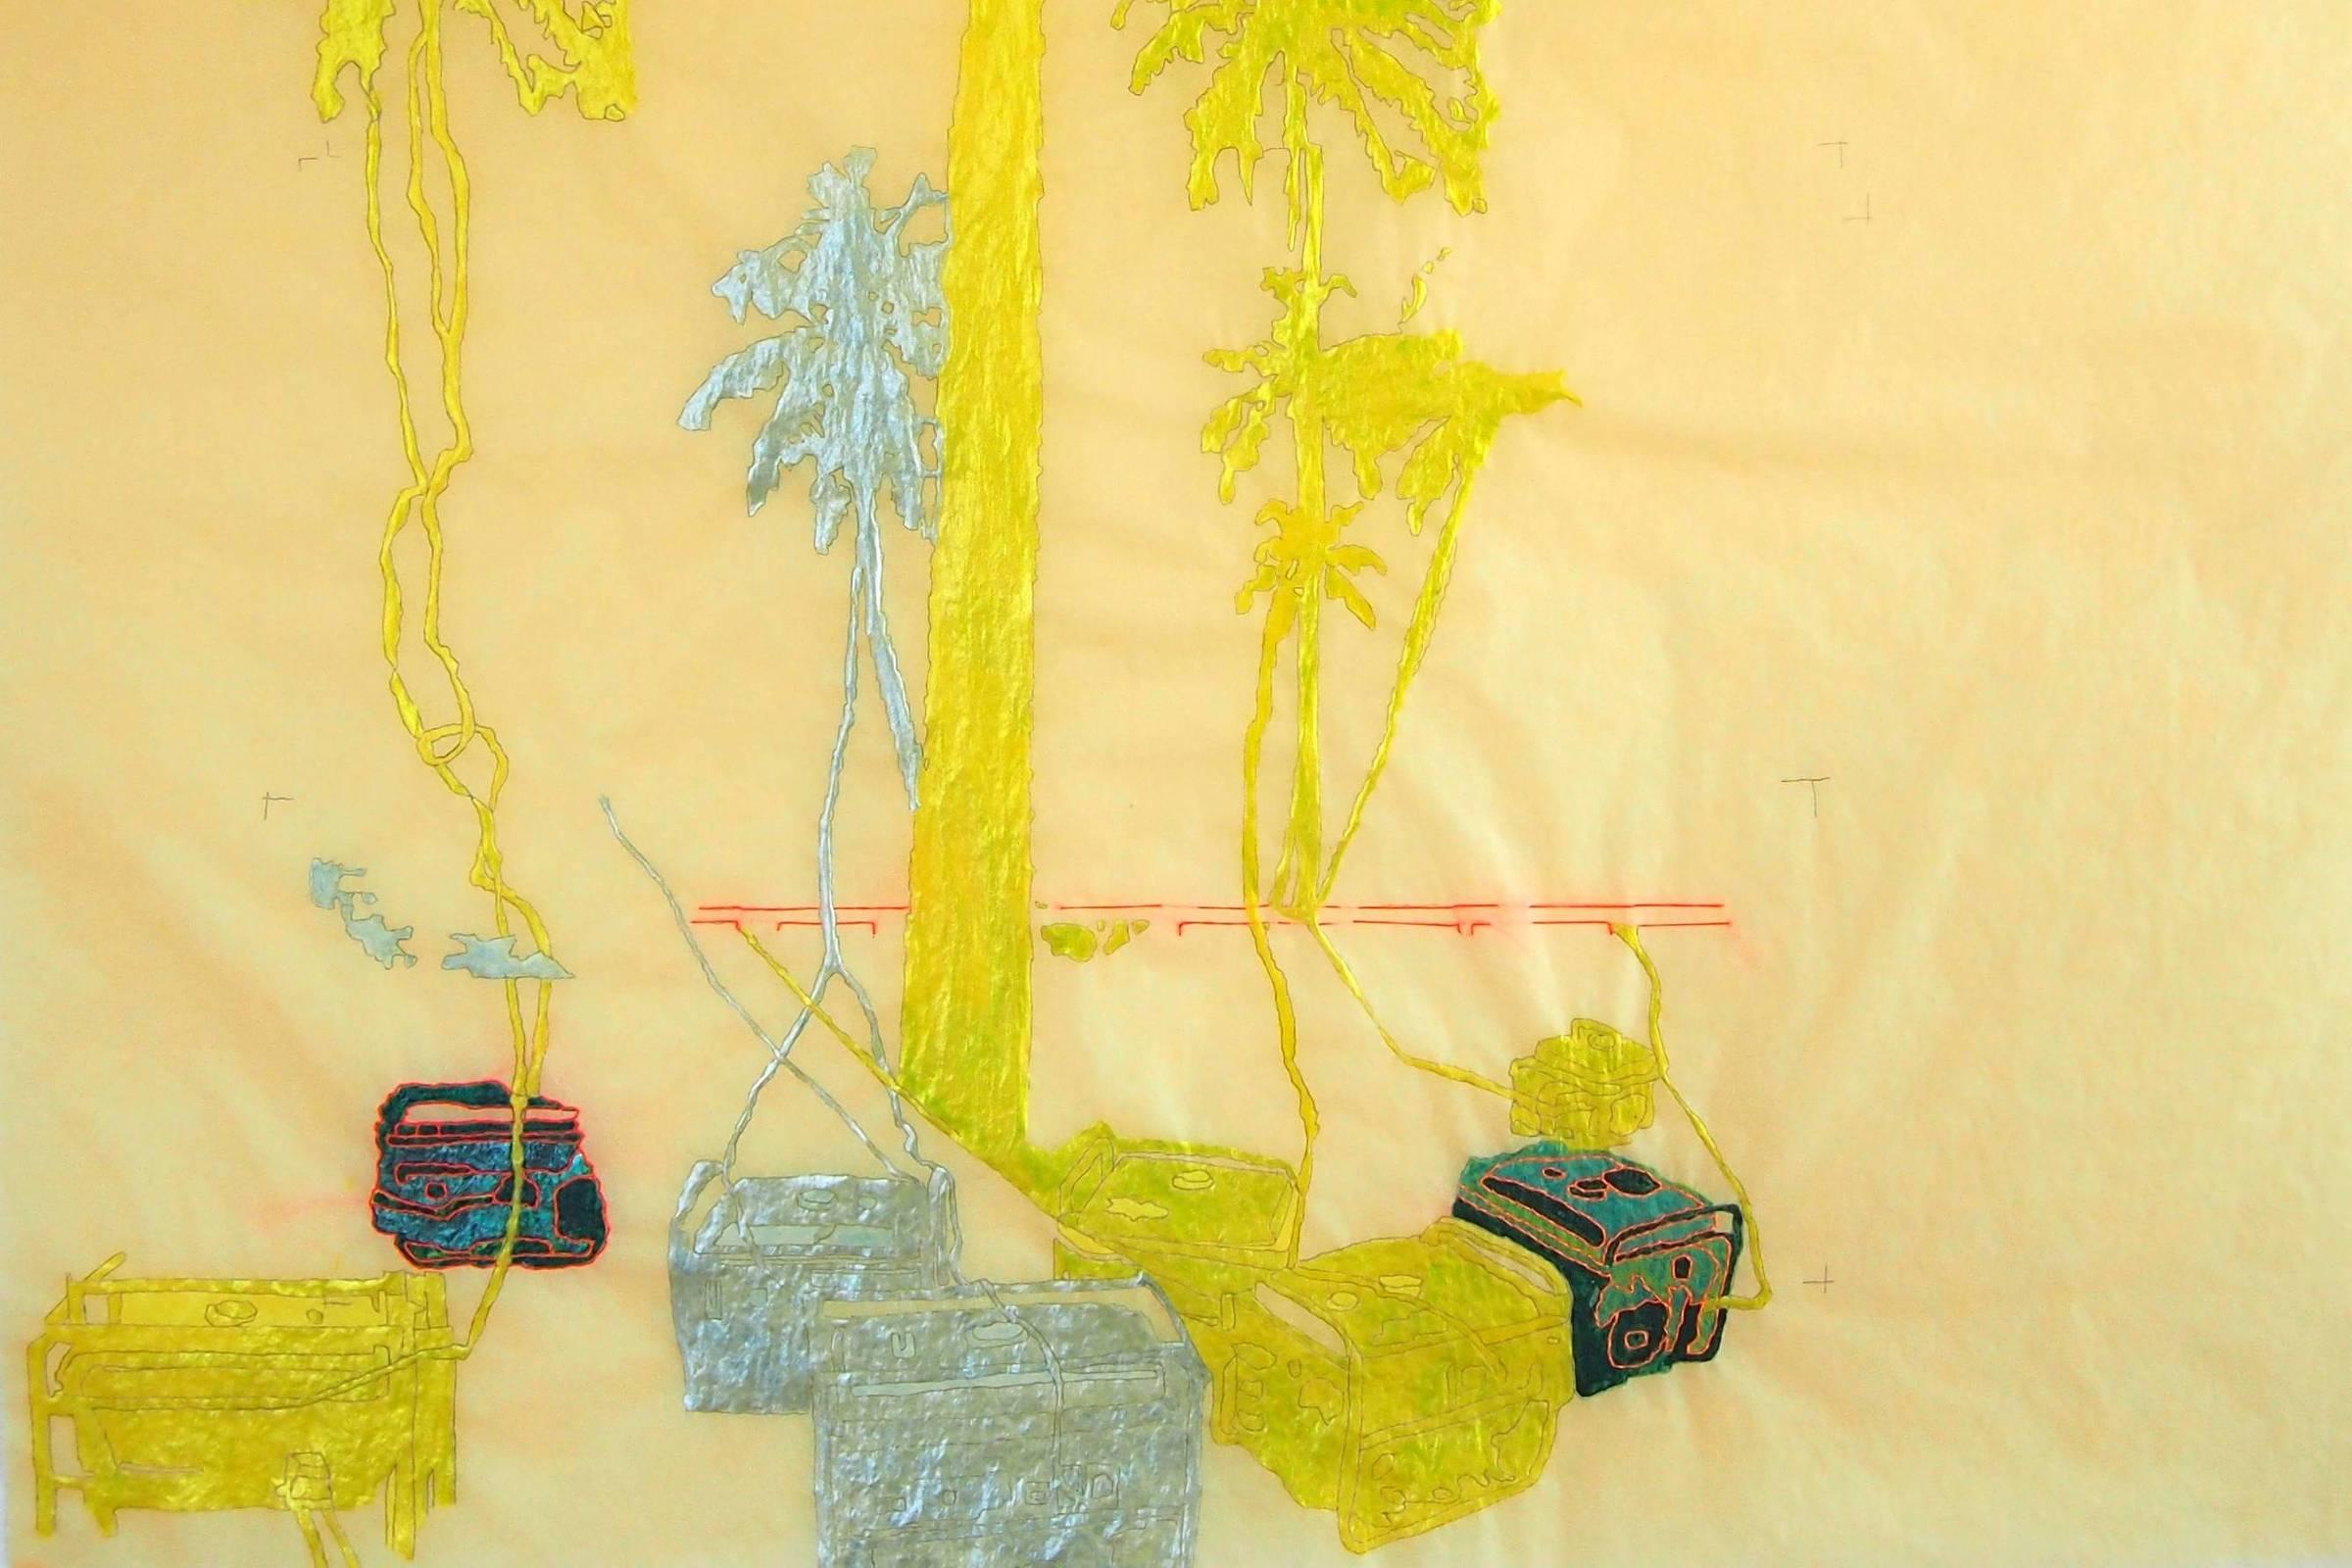 'Generators', de 2014, de Wura-Natasha Ogunji (Divulgação)